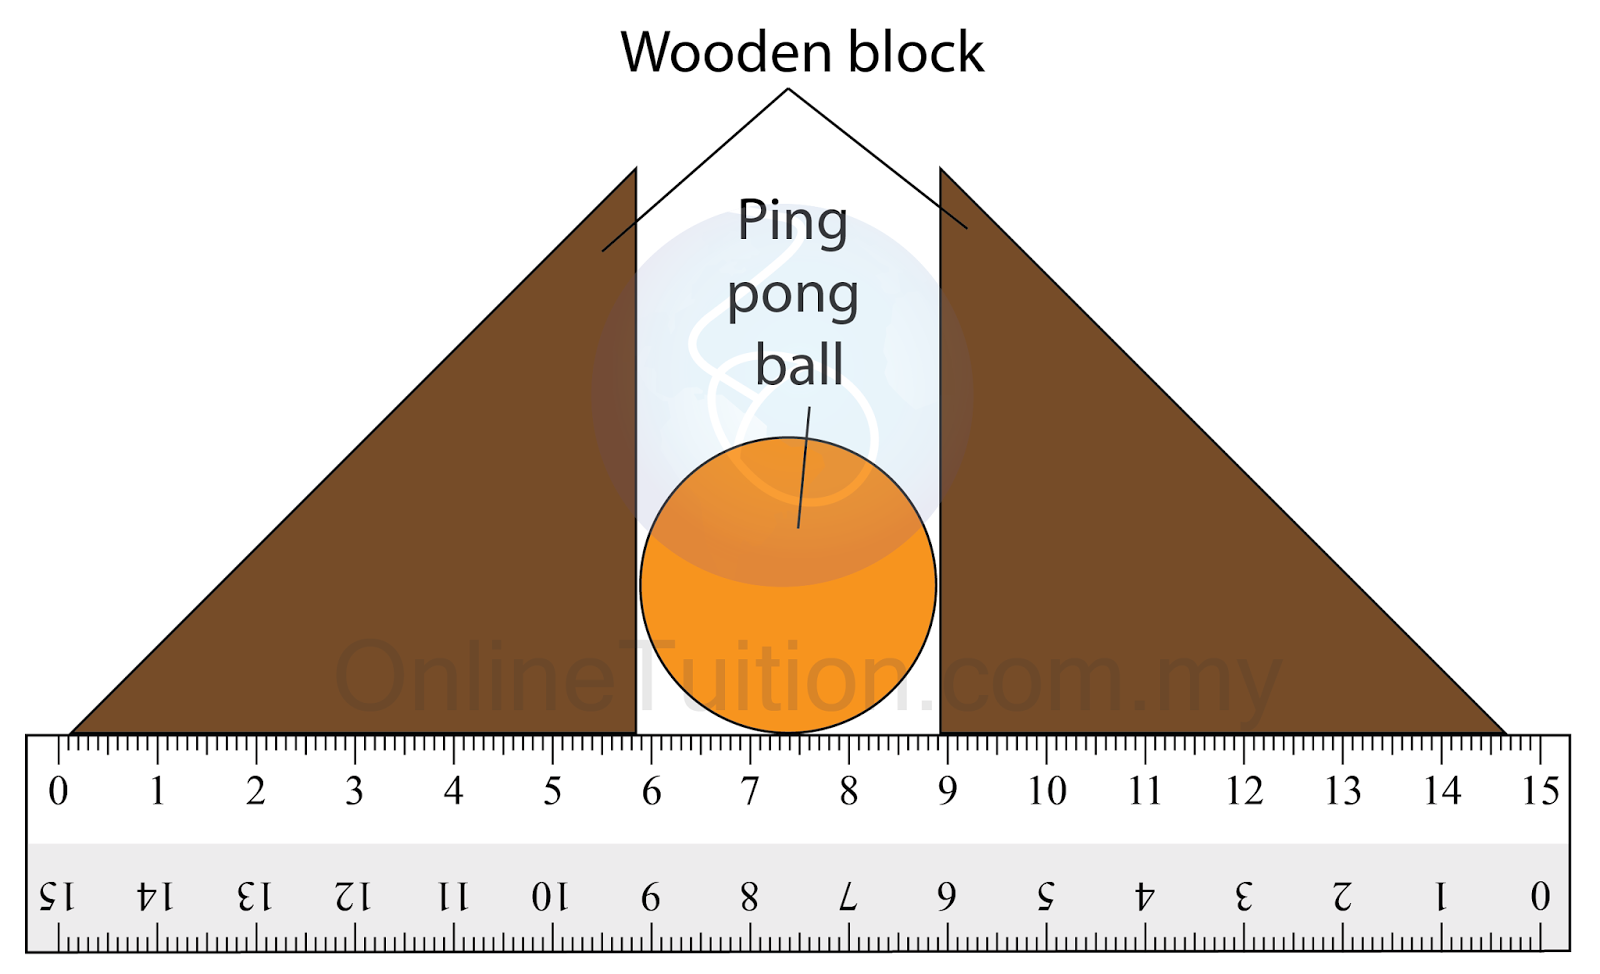 How to measure the diameter 1